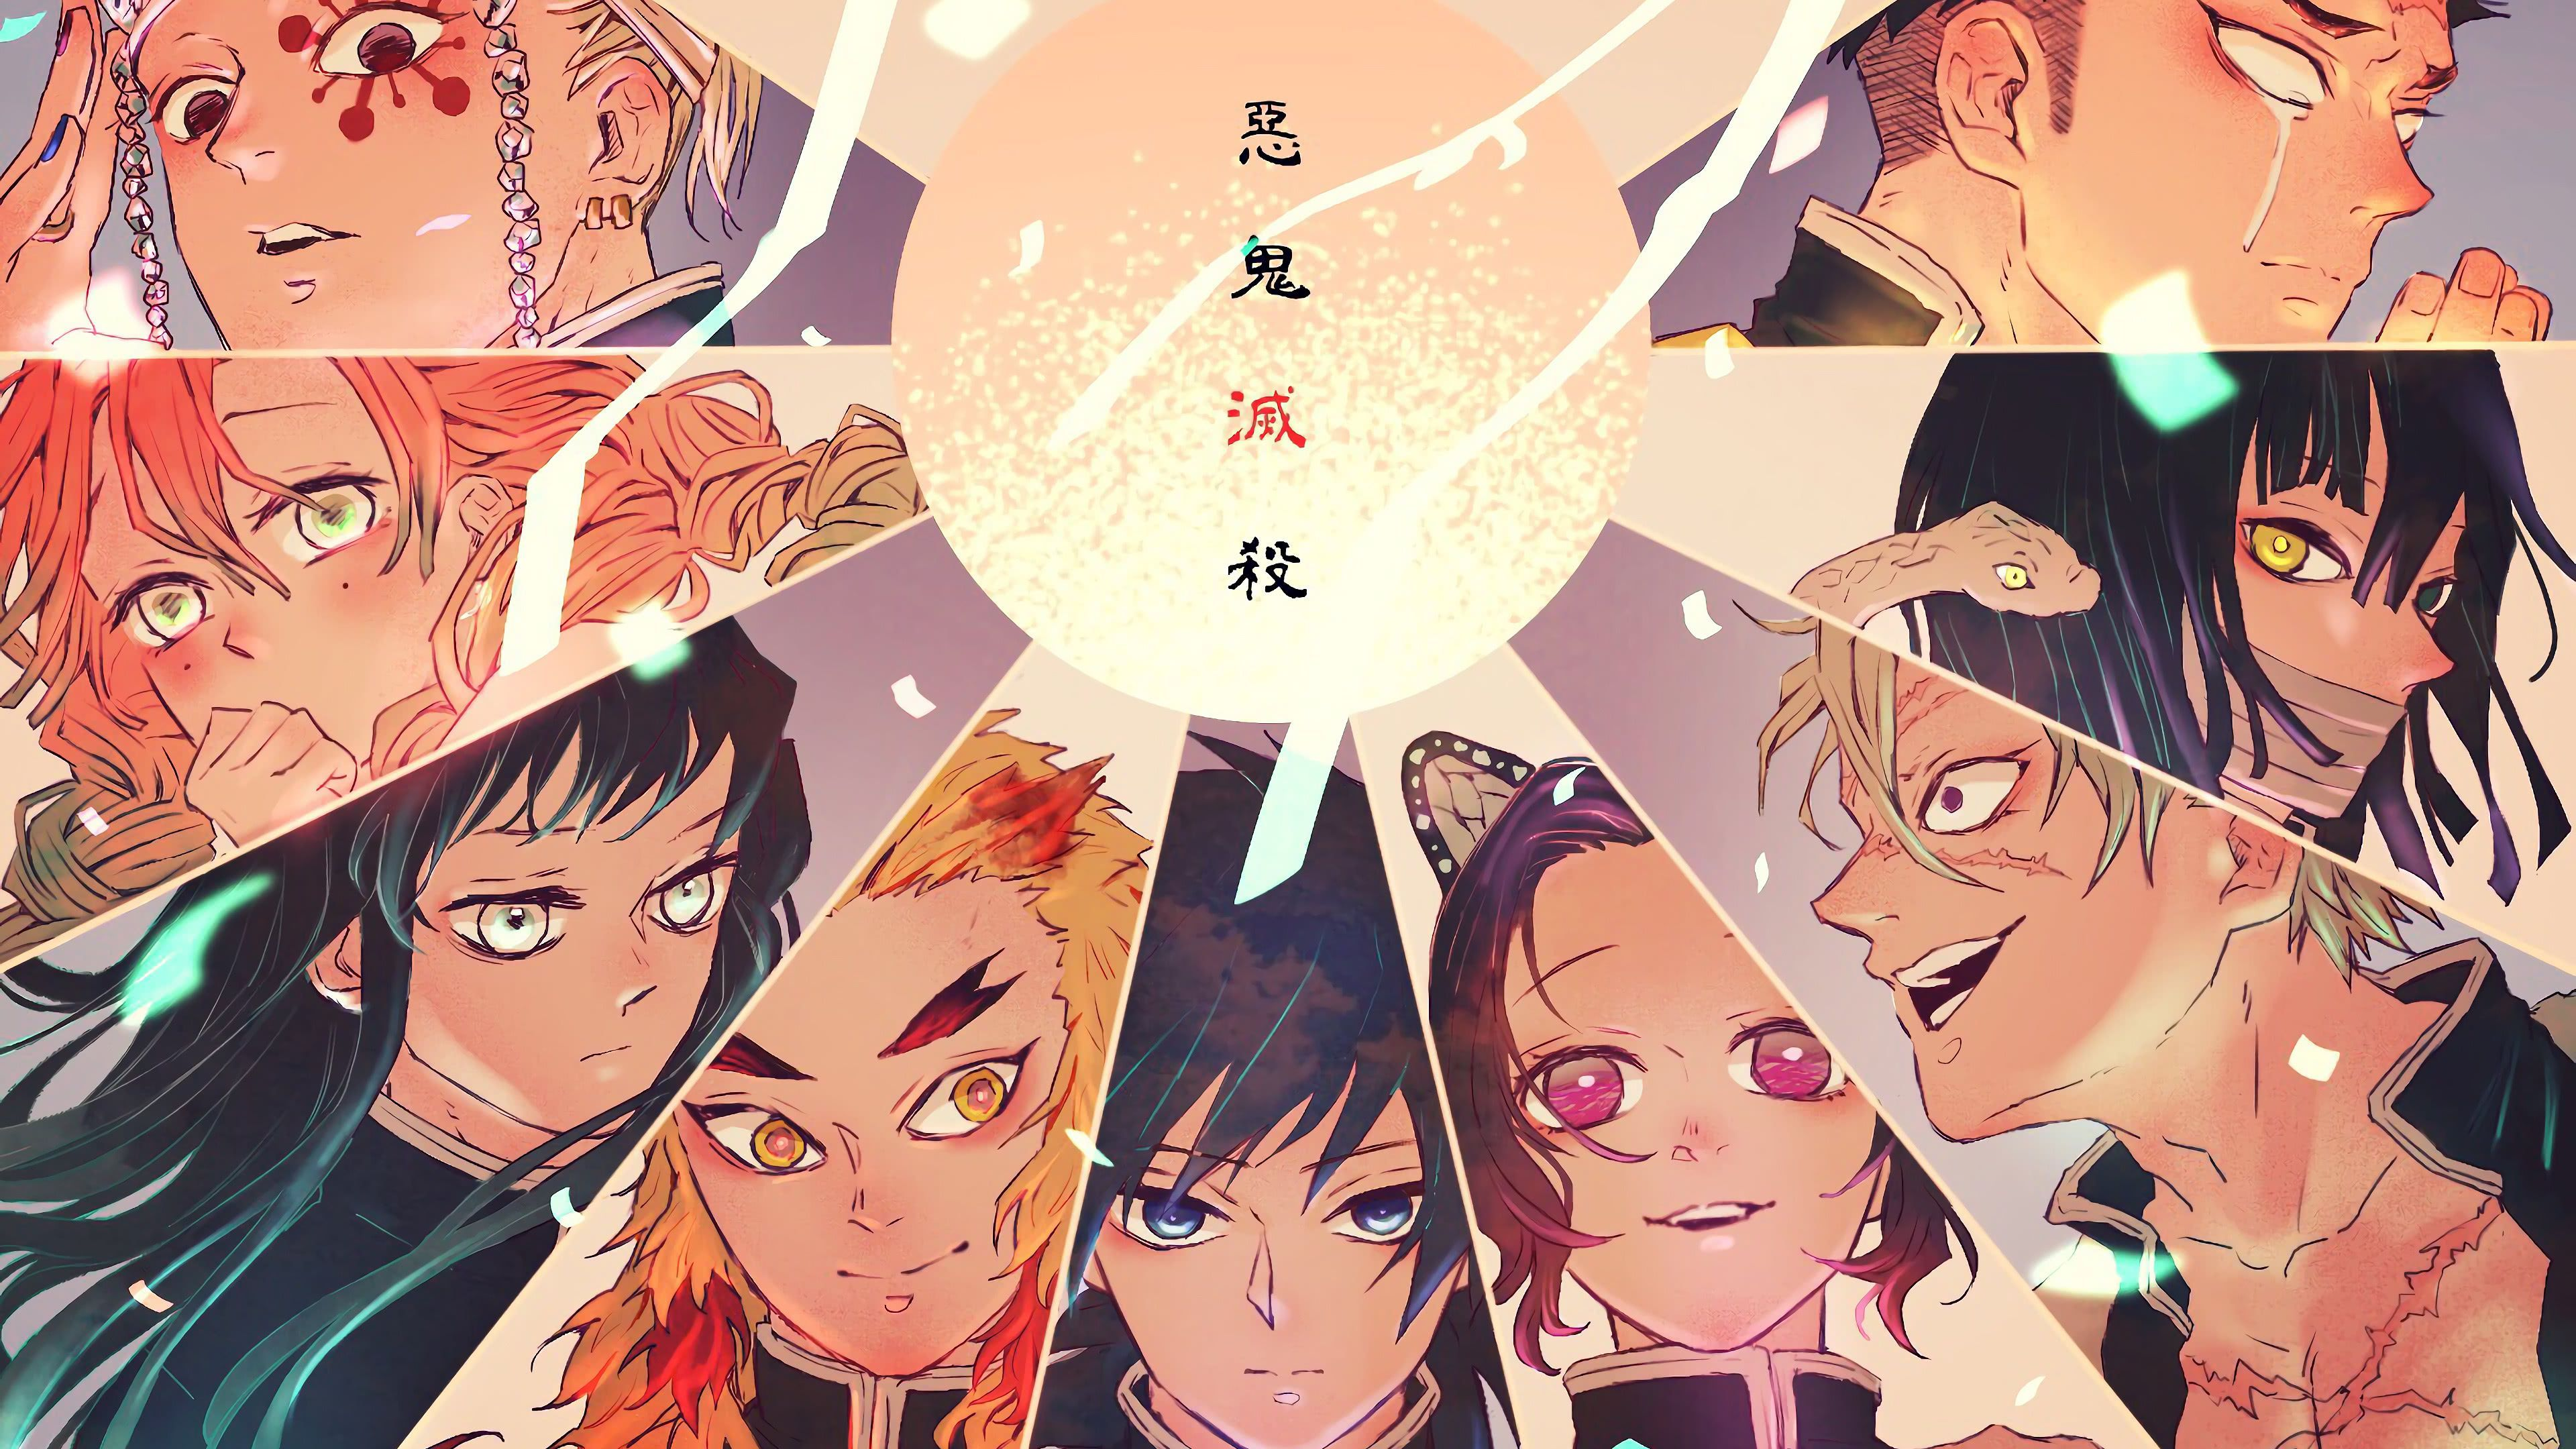 Wallpaper In 2020 Hd Anime Wallpapers Wallpaper Backgrounds Anime Wallpaper